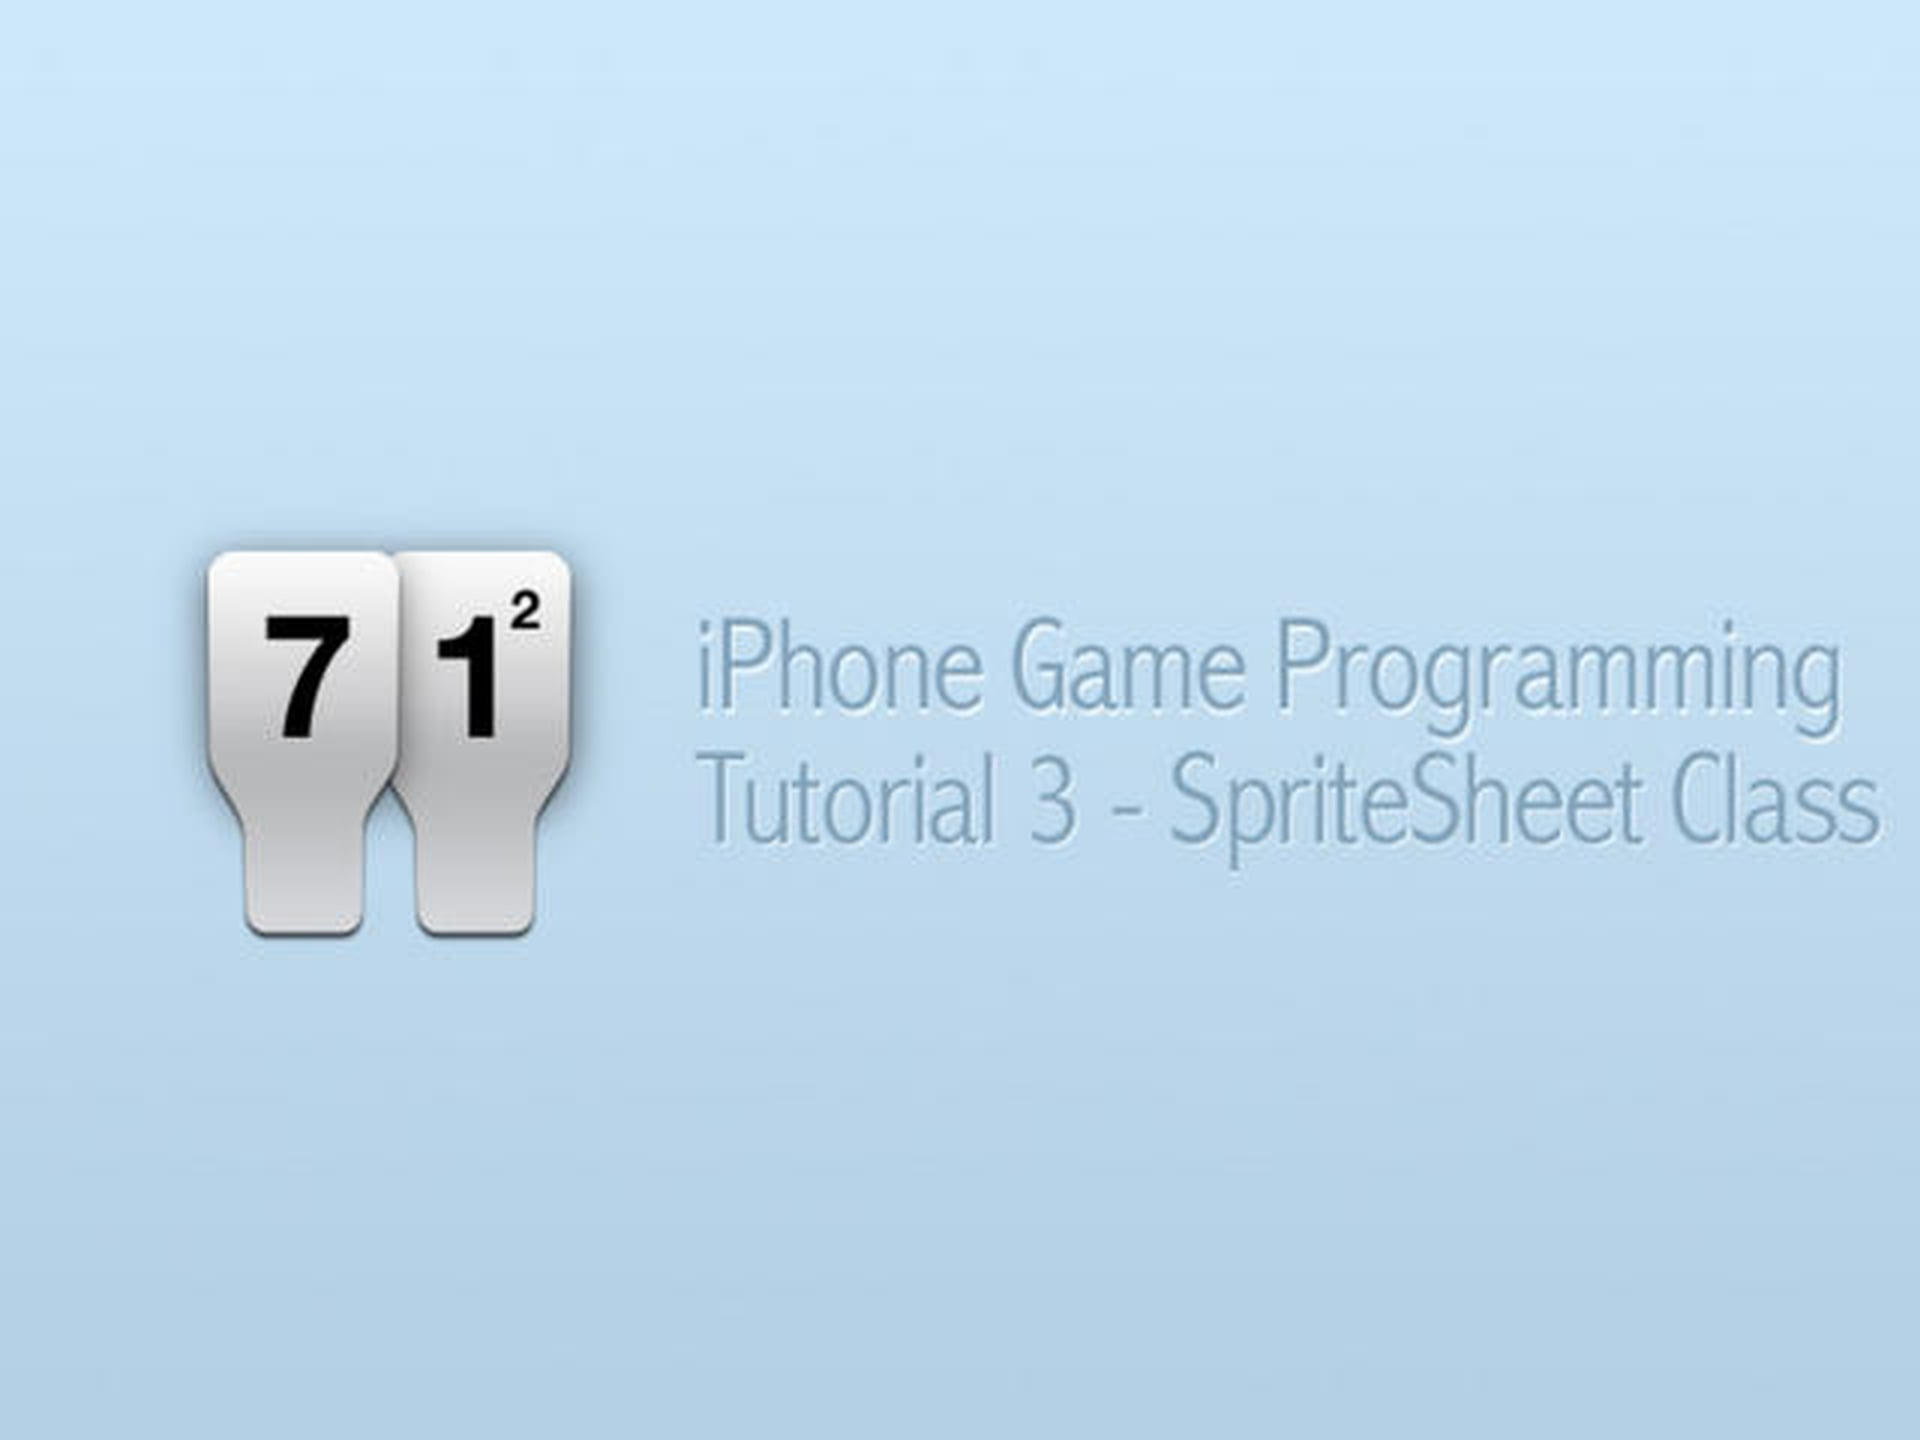 iPhone Game Programming – Tutorial 3 – SpriteSheet Class